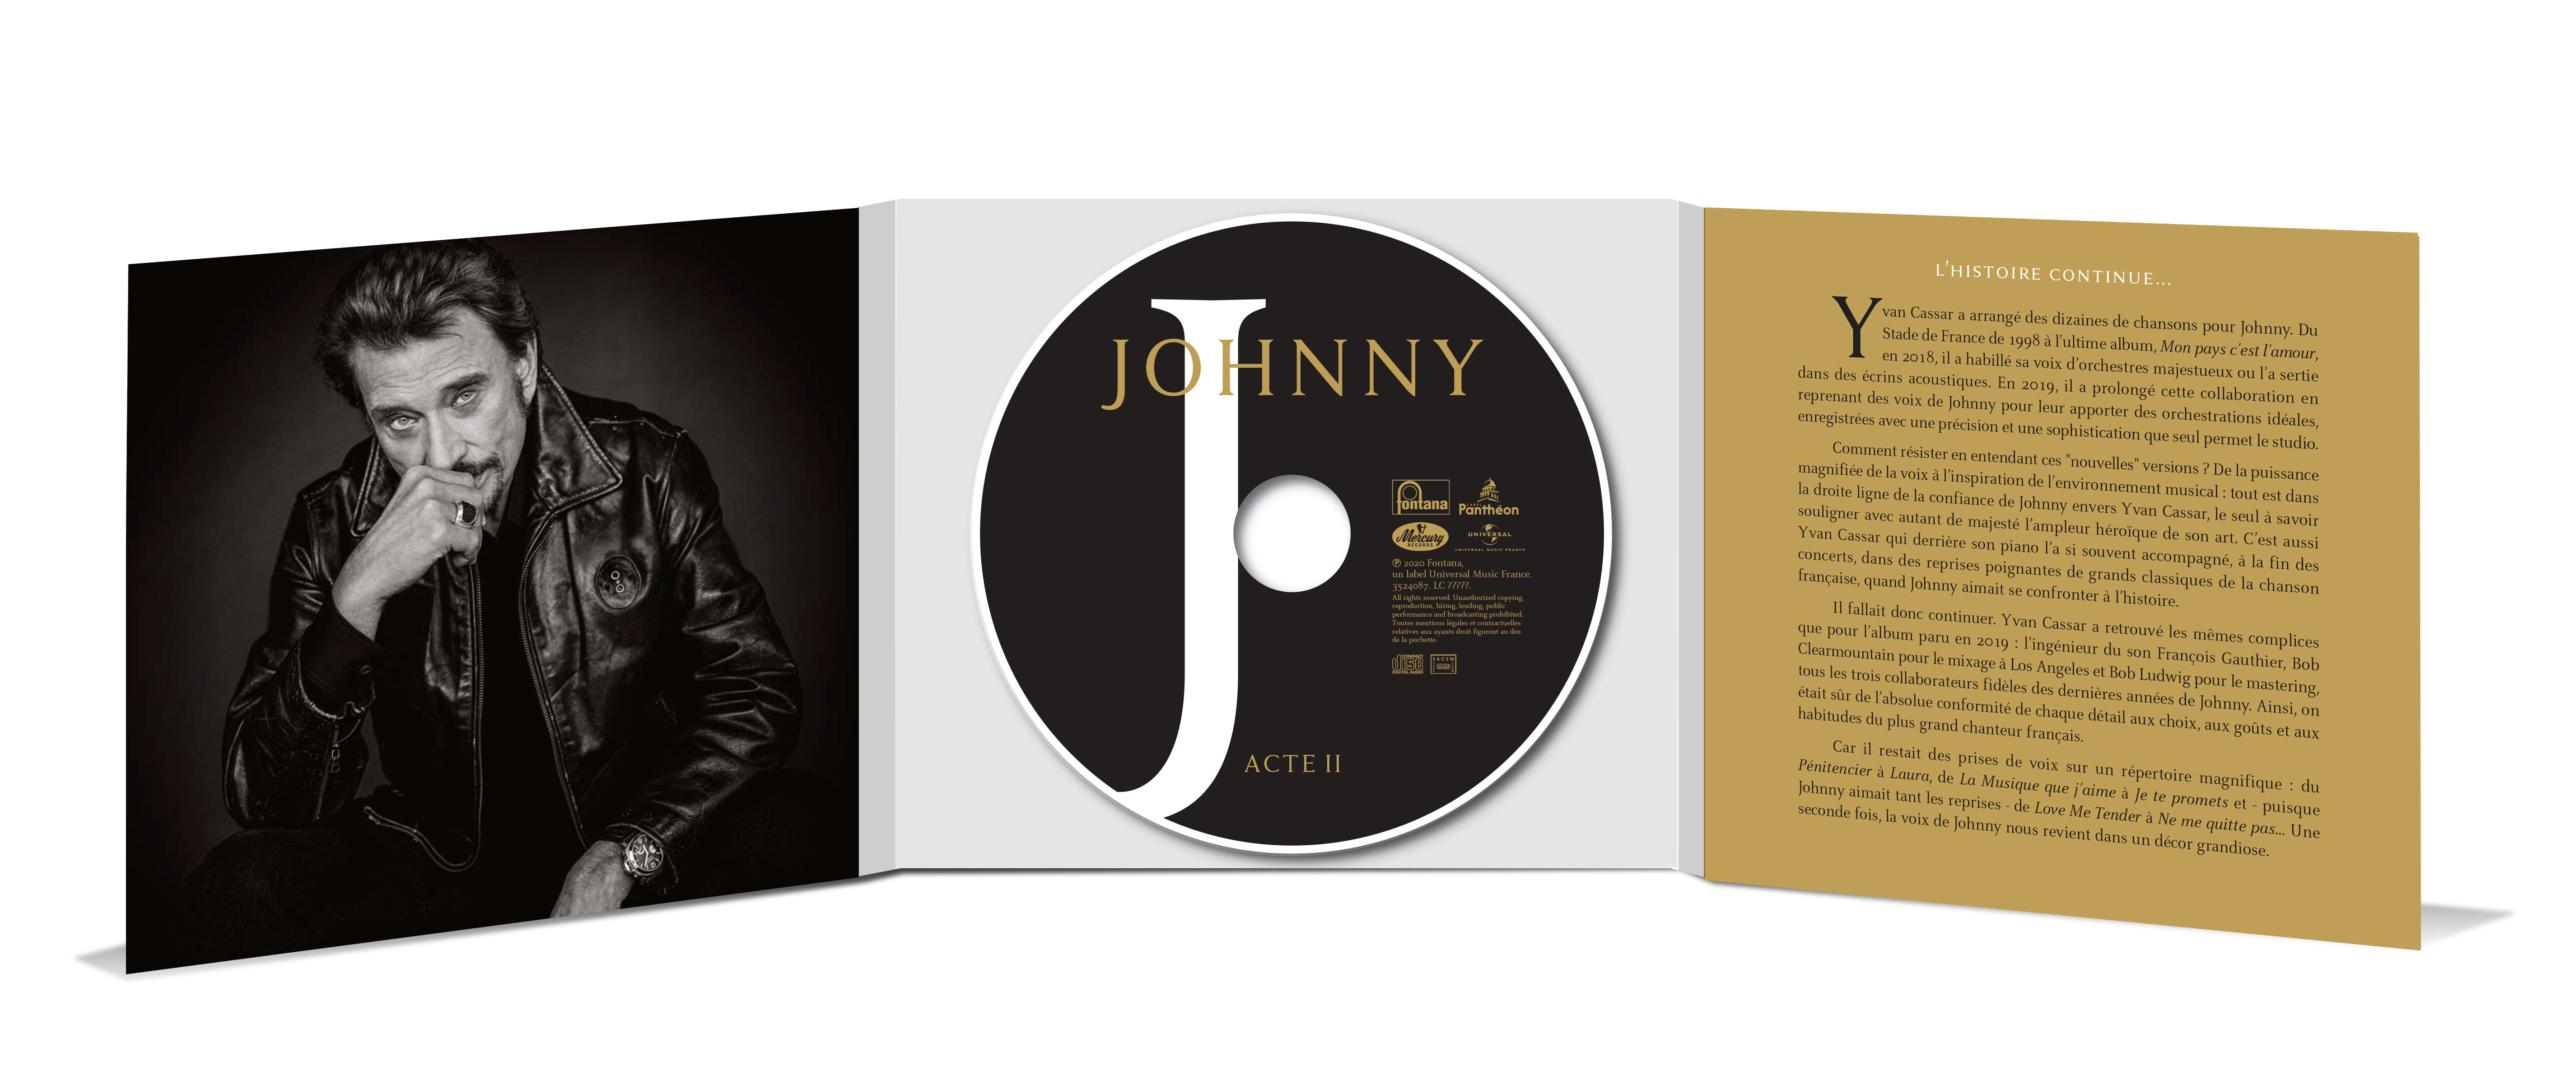 Visuel de l'Acte II Johnny38